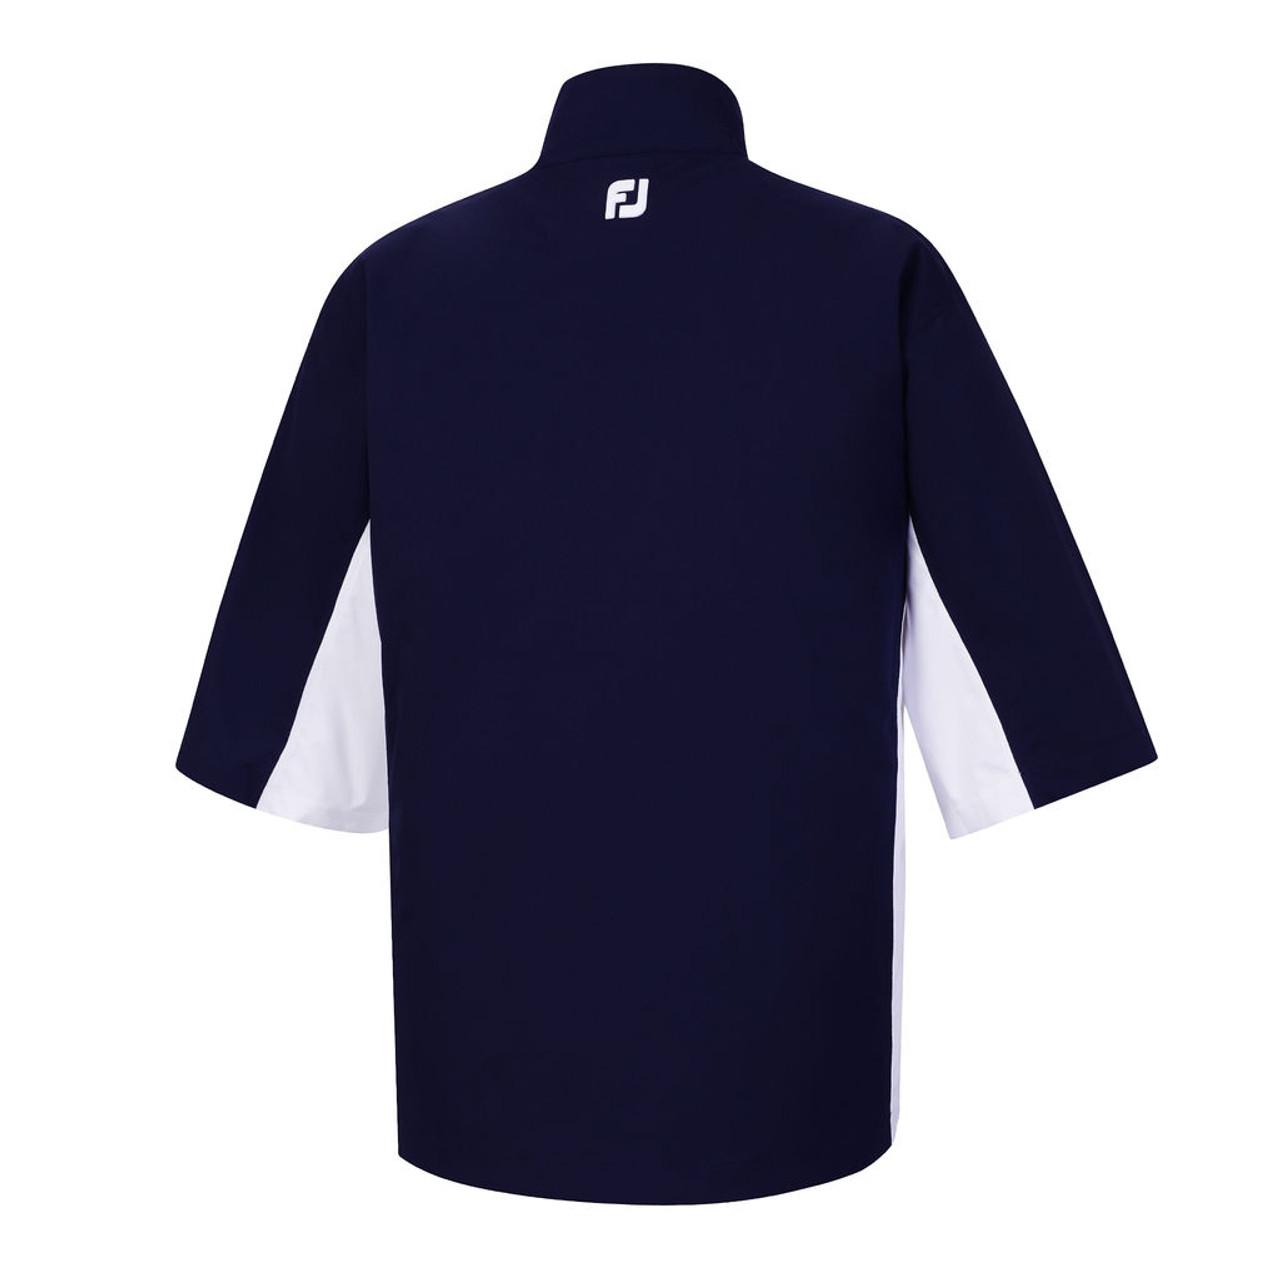 FootJoy FJ Hydrolite Short Sleeve Rain Shirt - Navy / White / Black (23729)